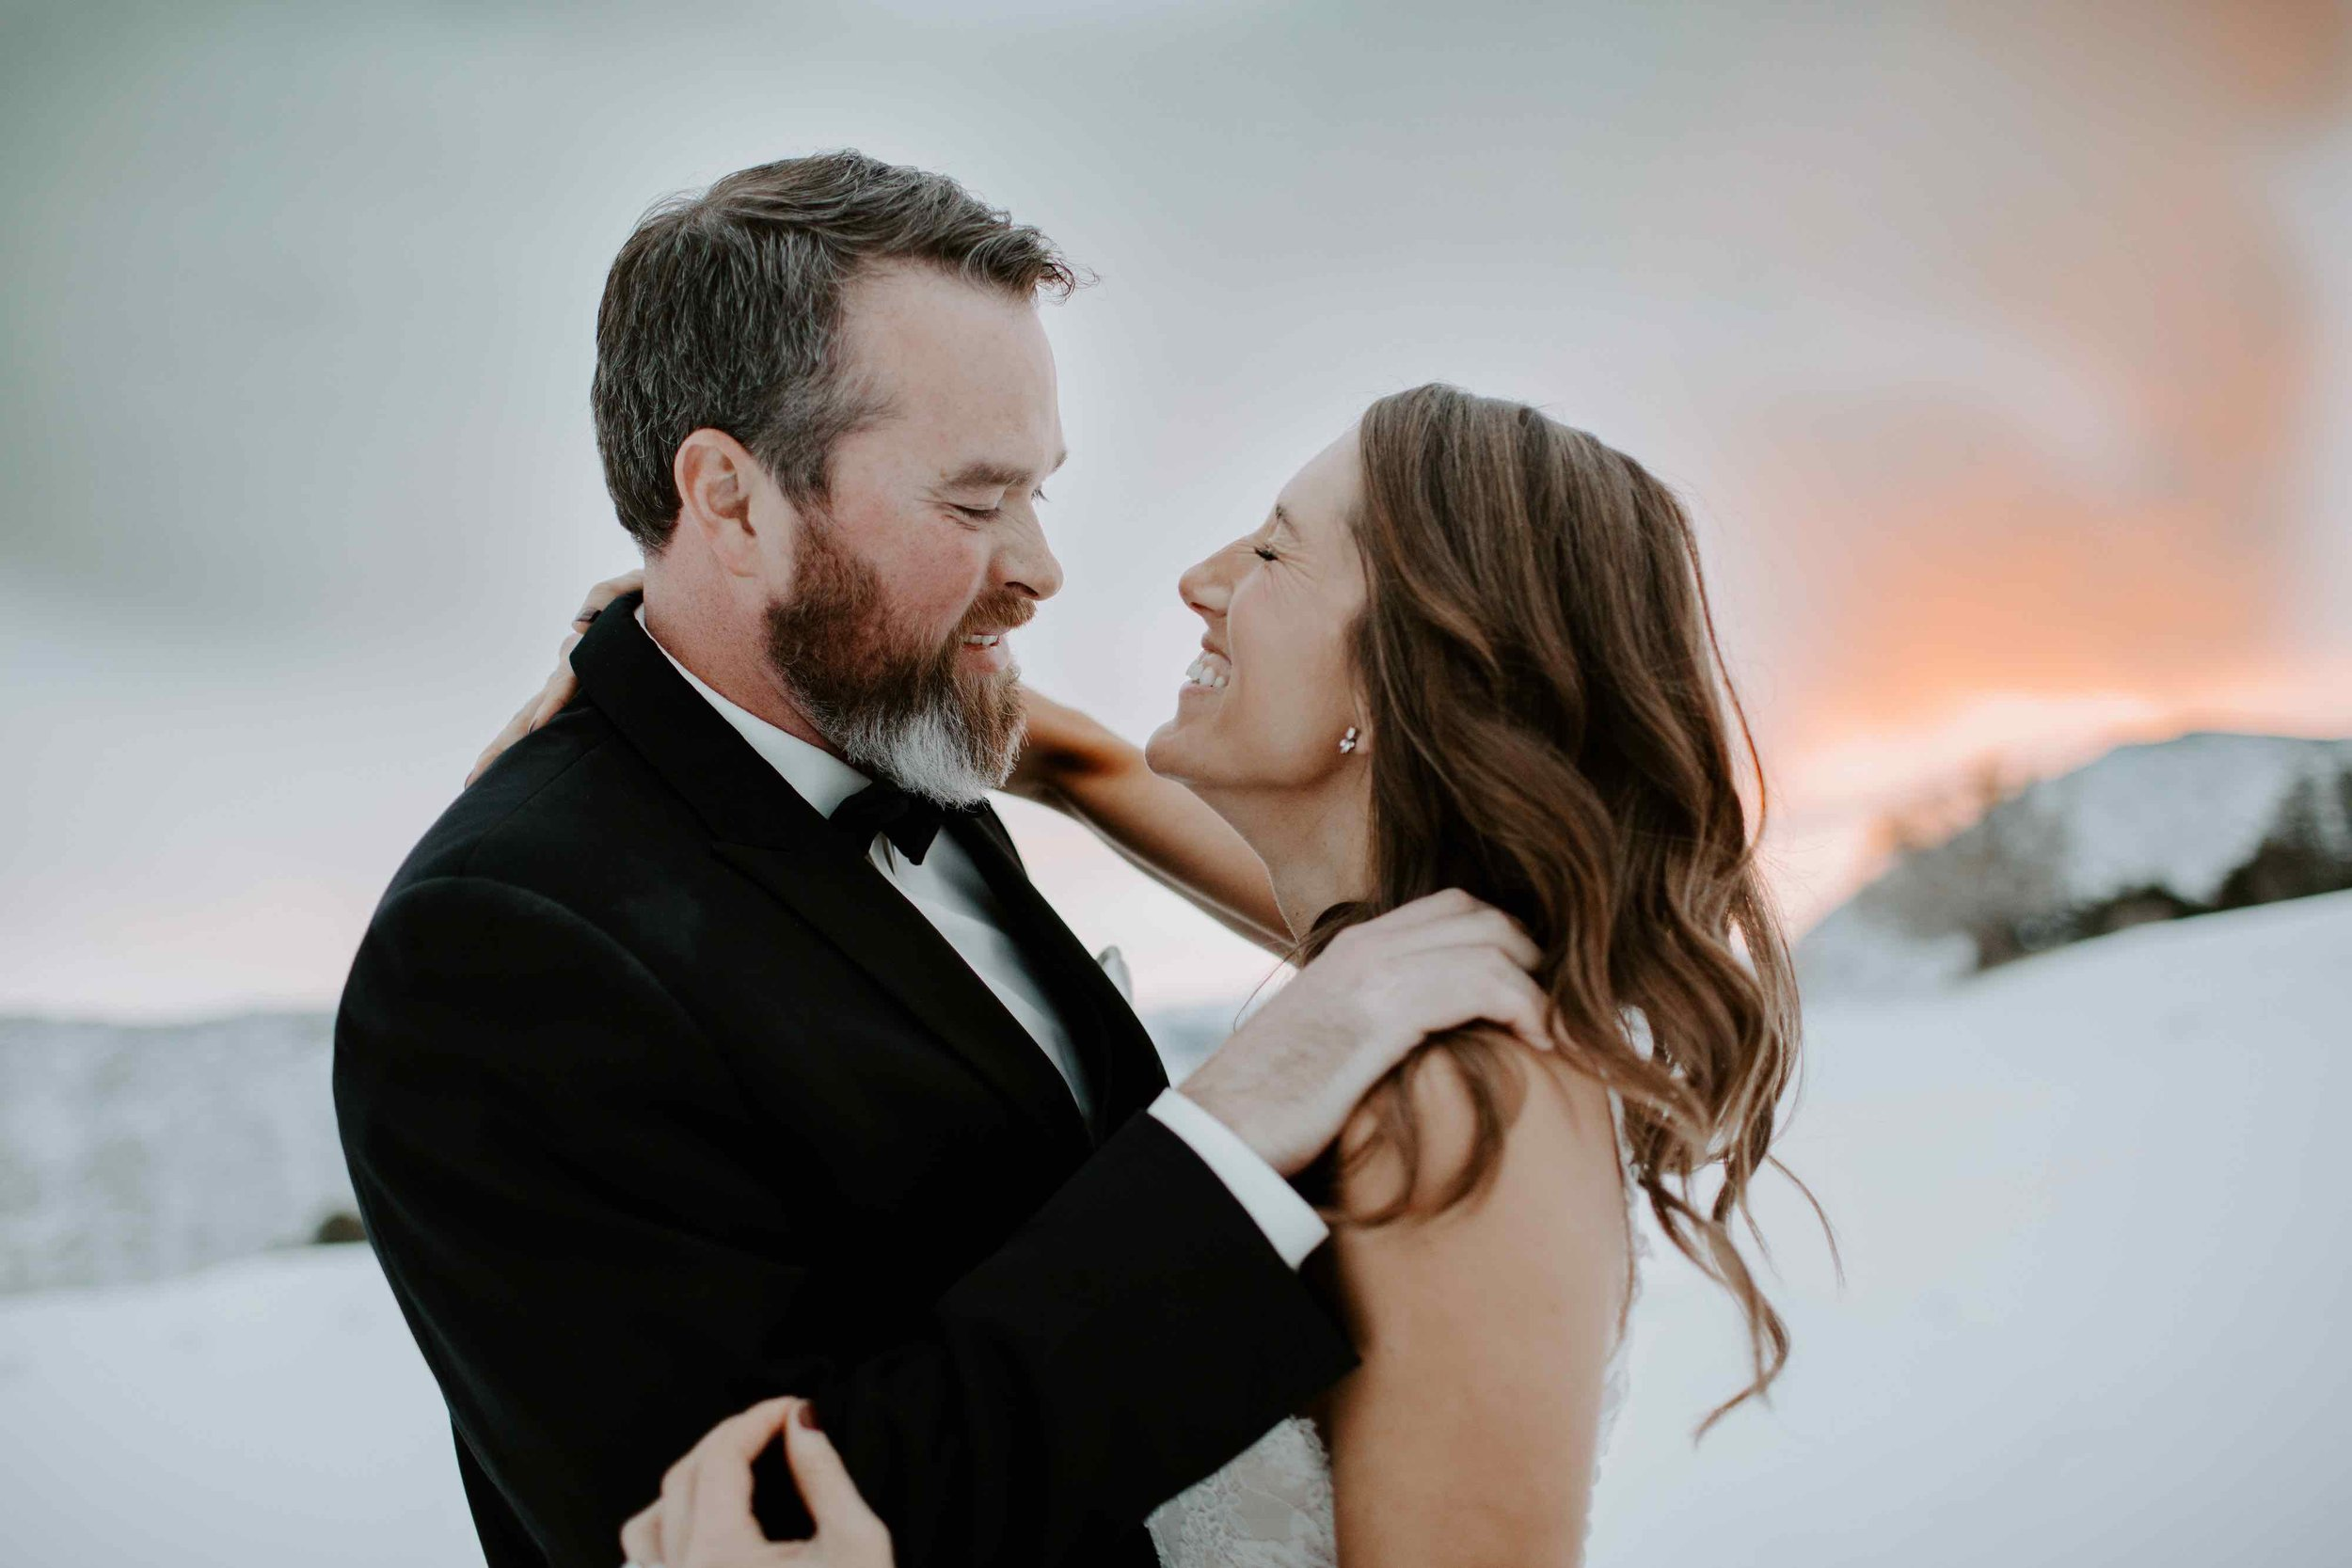 Kisa Conrad Favorites-0044-colorado-wedding-photographer-denver-springs-vailhotel-glenwood-springs-colorado-wedding-photographer.jpeg